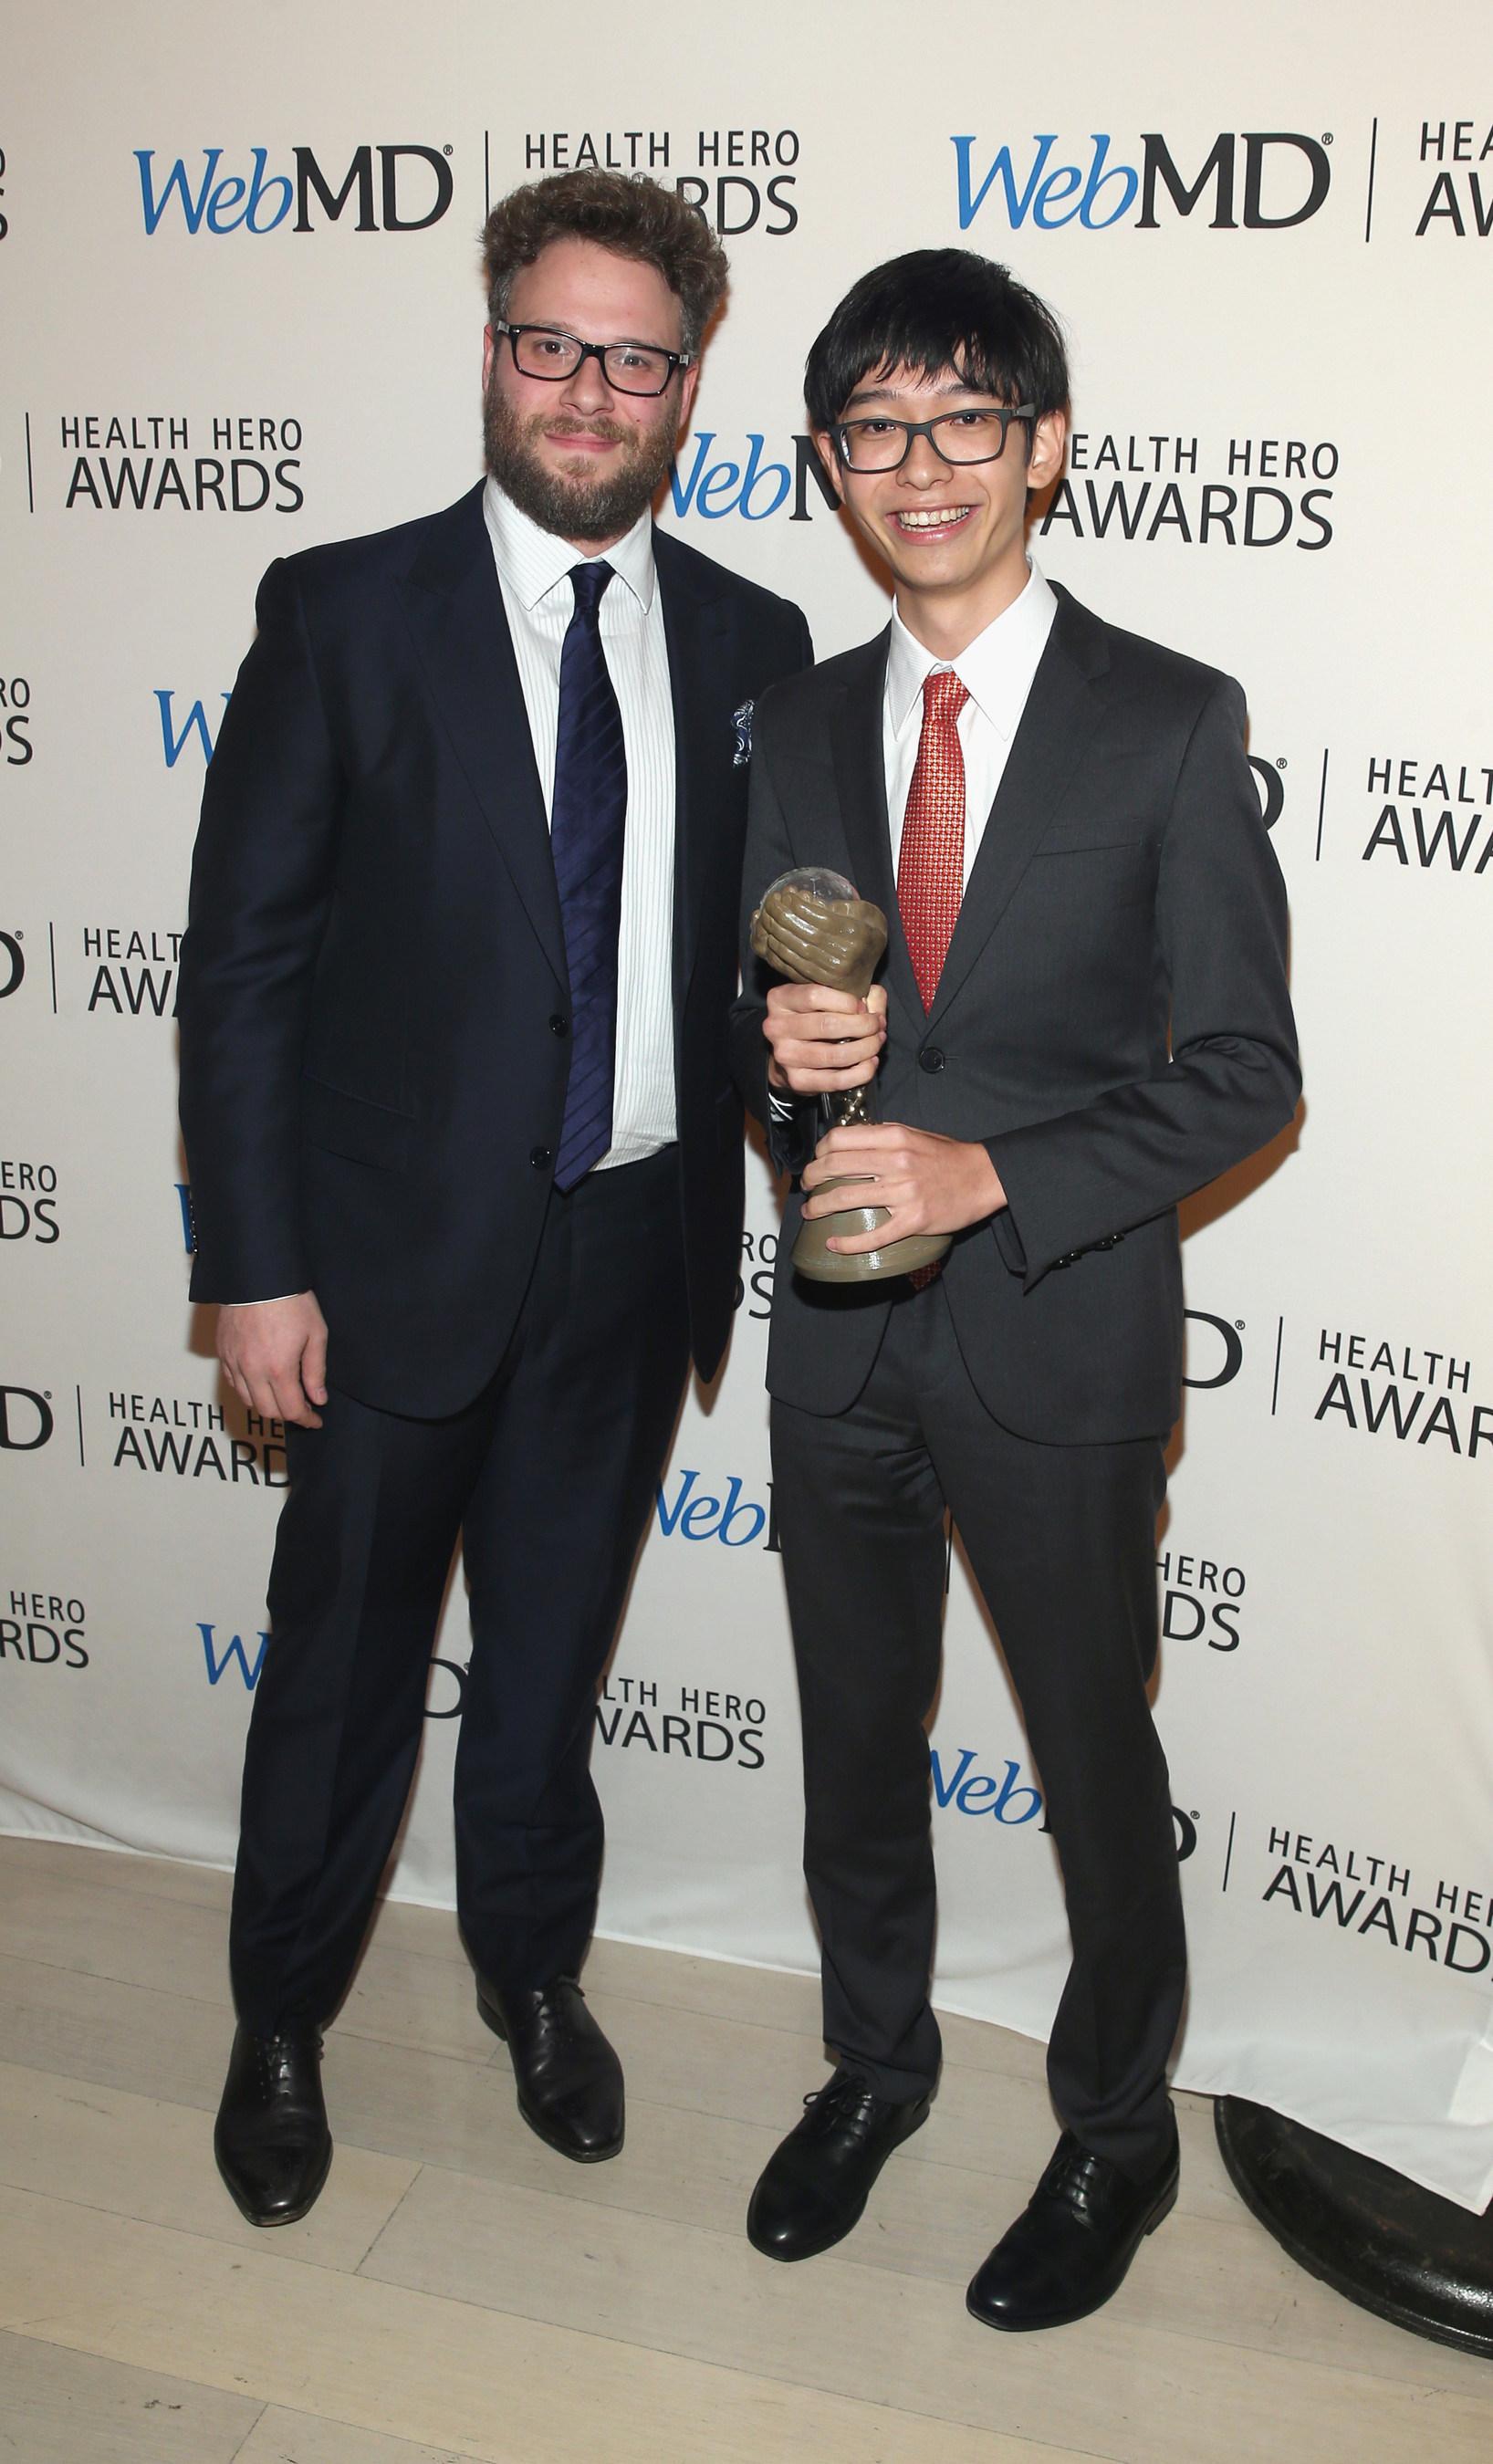 Seth Rogen and WebMD Health Hero Prodigy Award Winner Kenneth Shinozuka Attend the WebMD Health Hero Awards Gala at TimesCenter on November 5, 2015